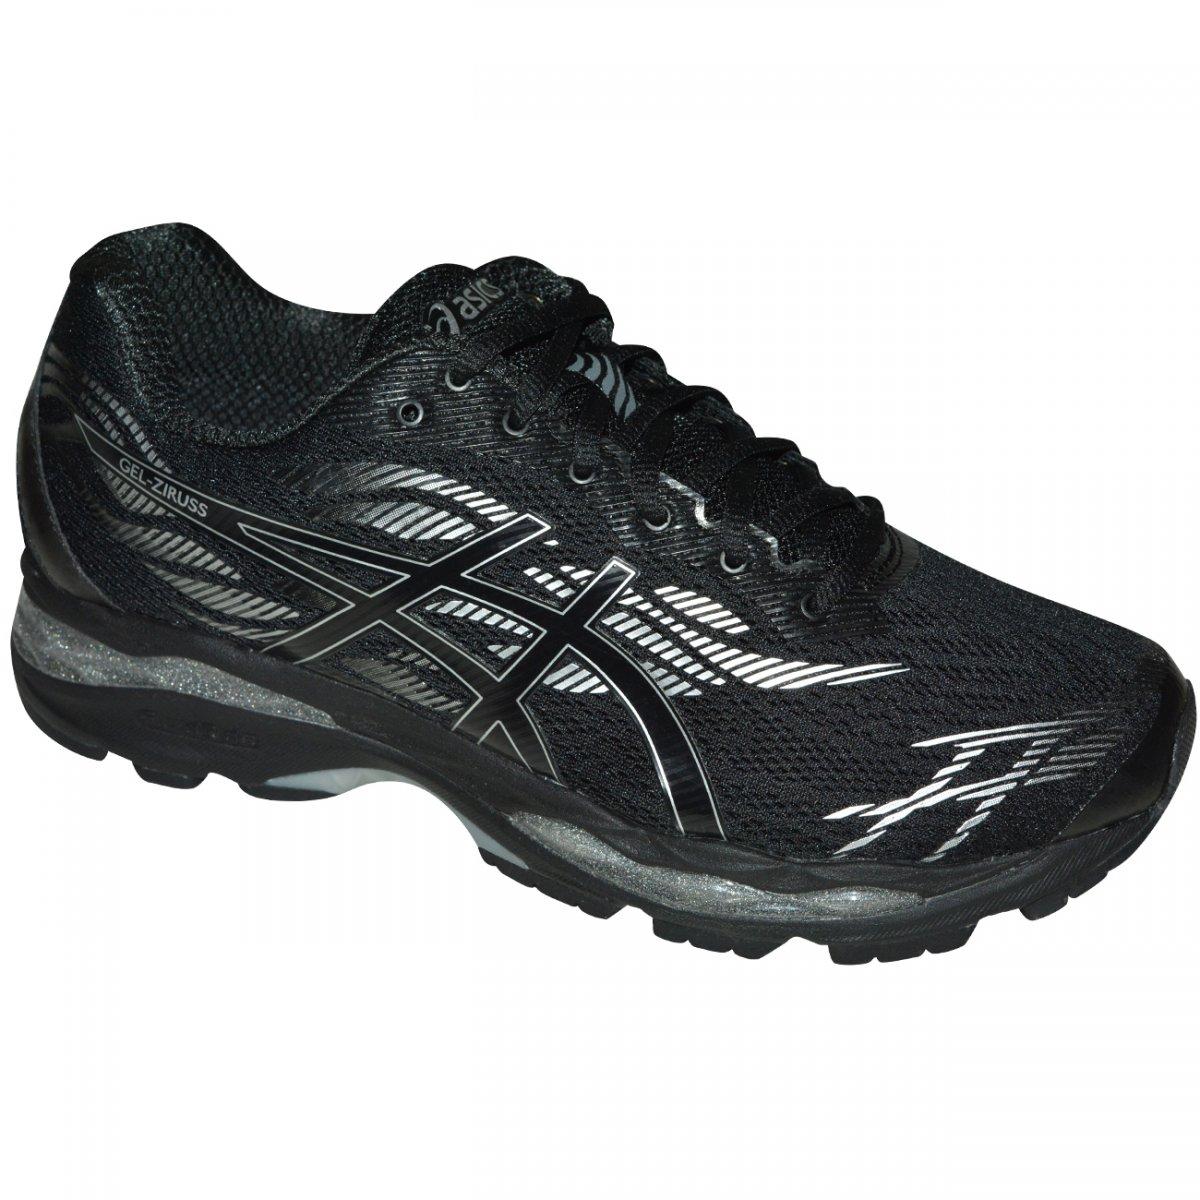 67429c52e Tenis Asics Gel-Ziruss T7J1N 9090 - Preto/preto/prata - Chuteira Nike,  Adidas. Sandalias Femininas. Sandy Calçados